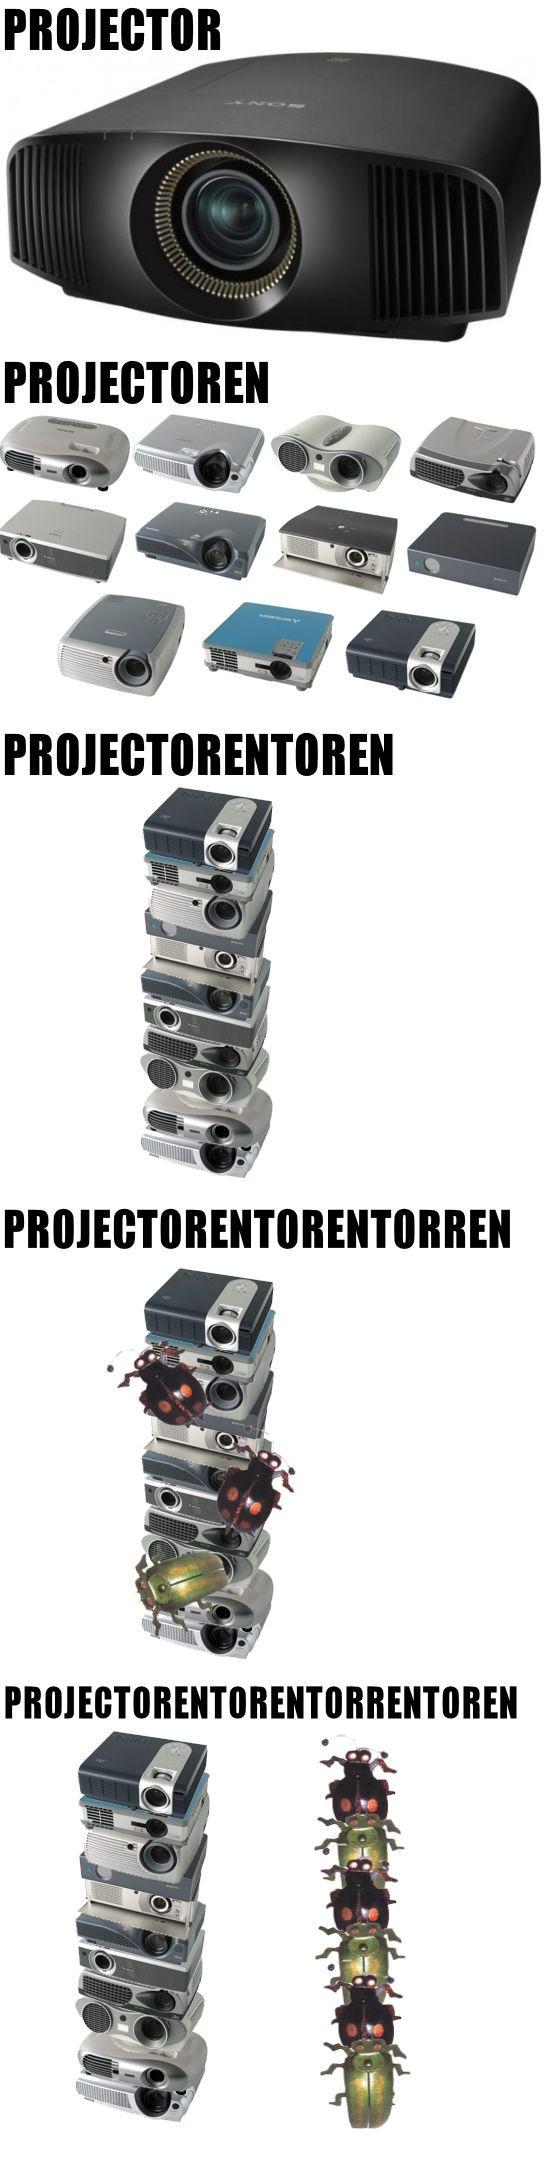 #projector #projectoren